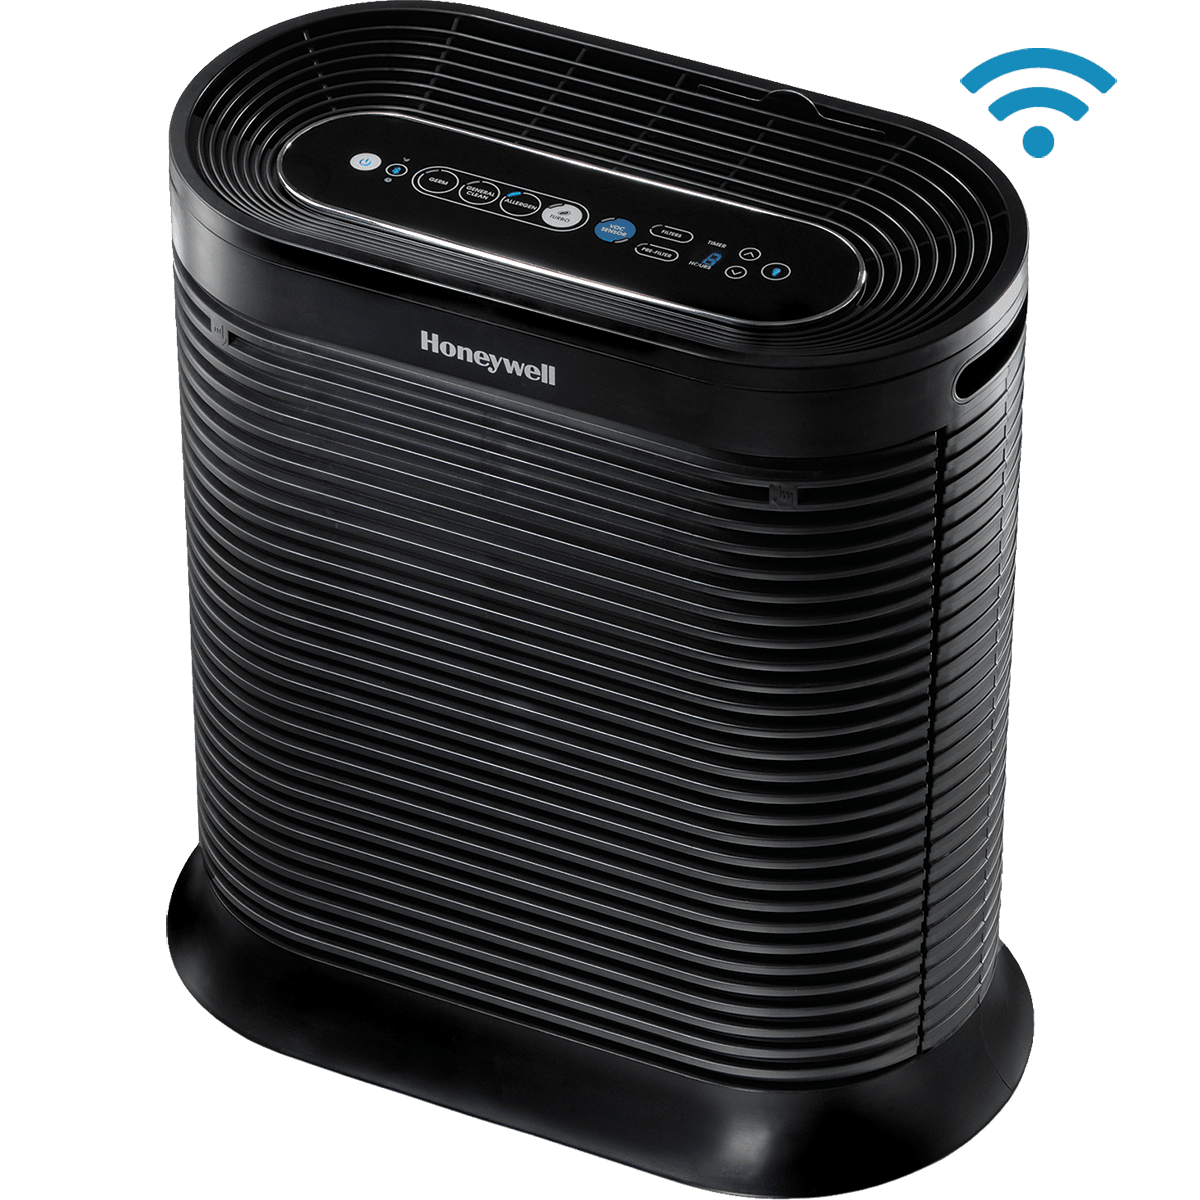 Honeywell HPA250B Bluetooth Smart True HEPA Allergen Remover Console Air Purifier - Black ho5507